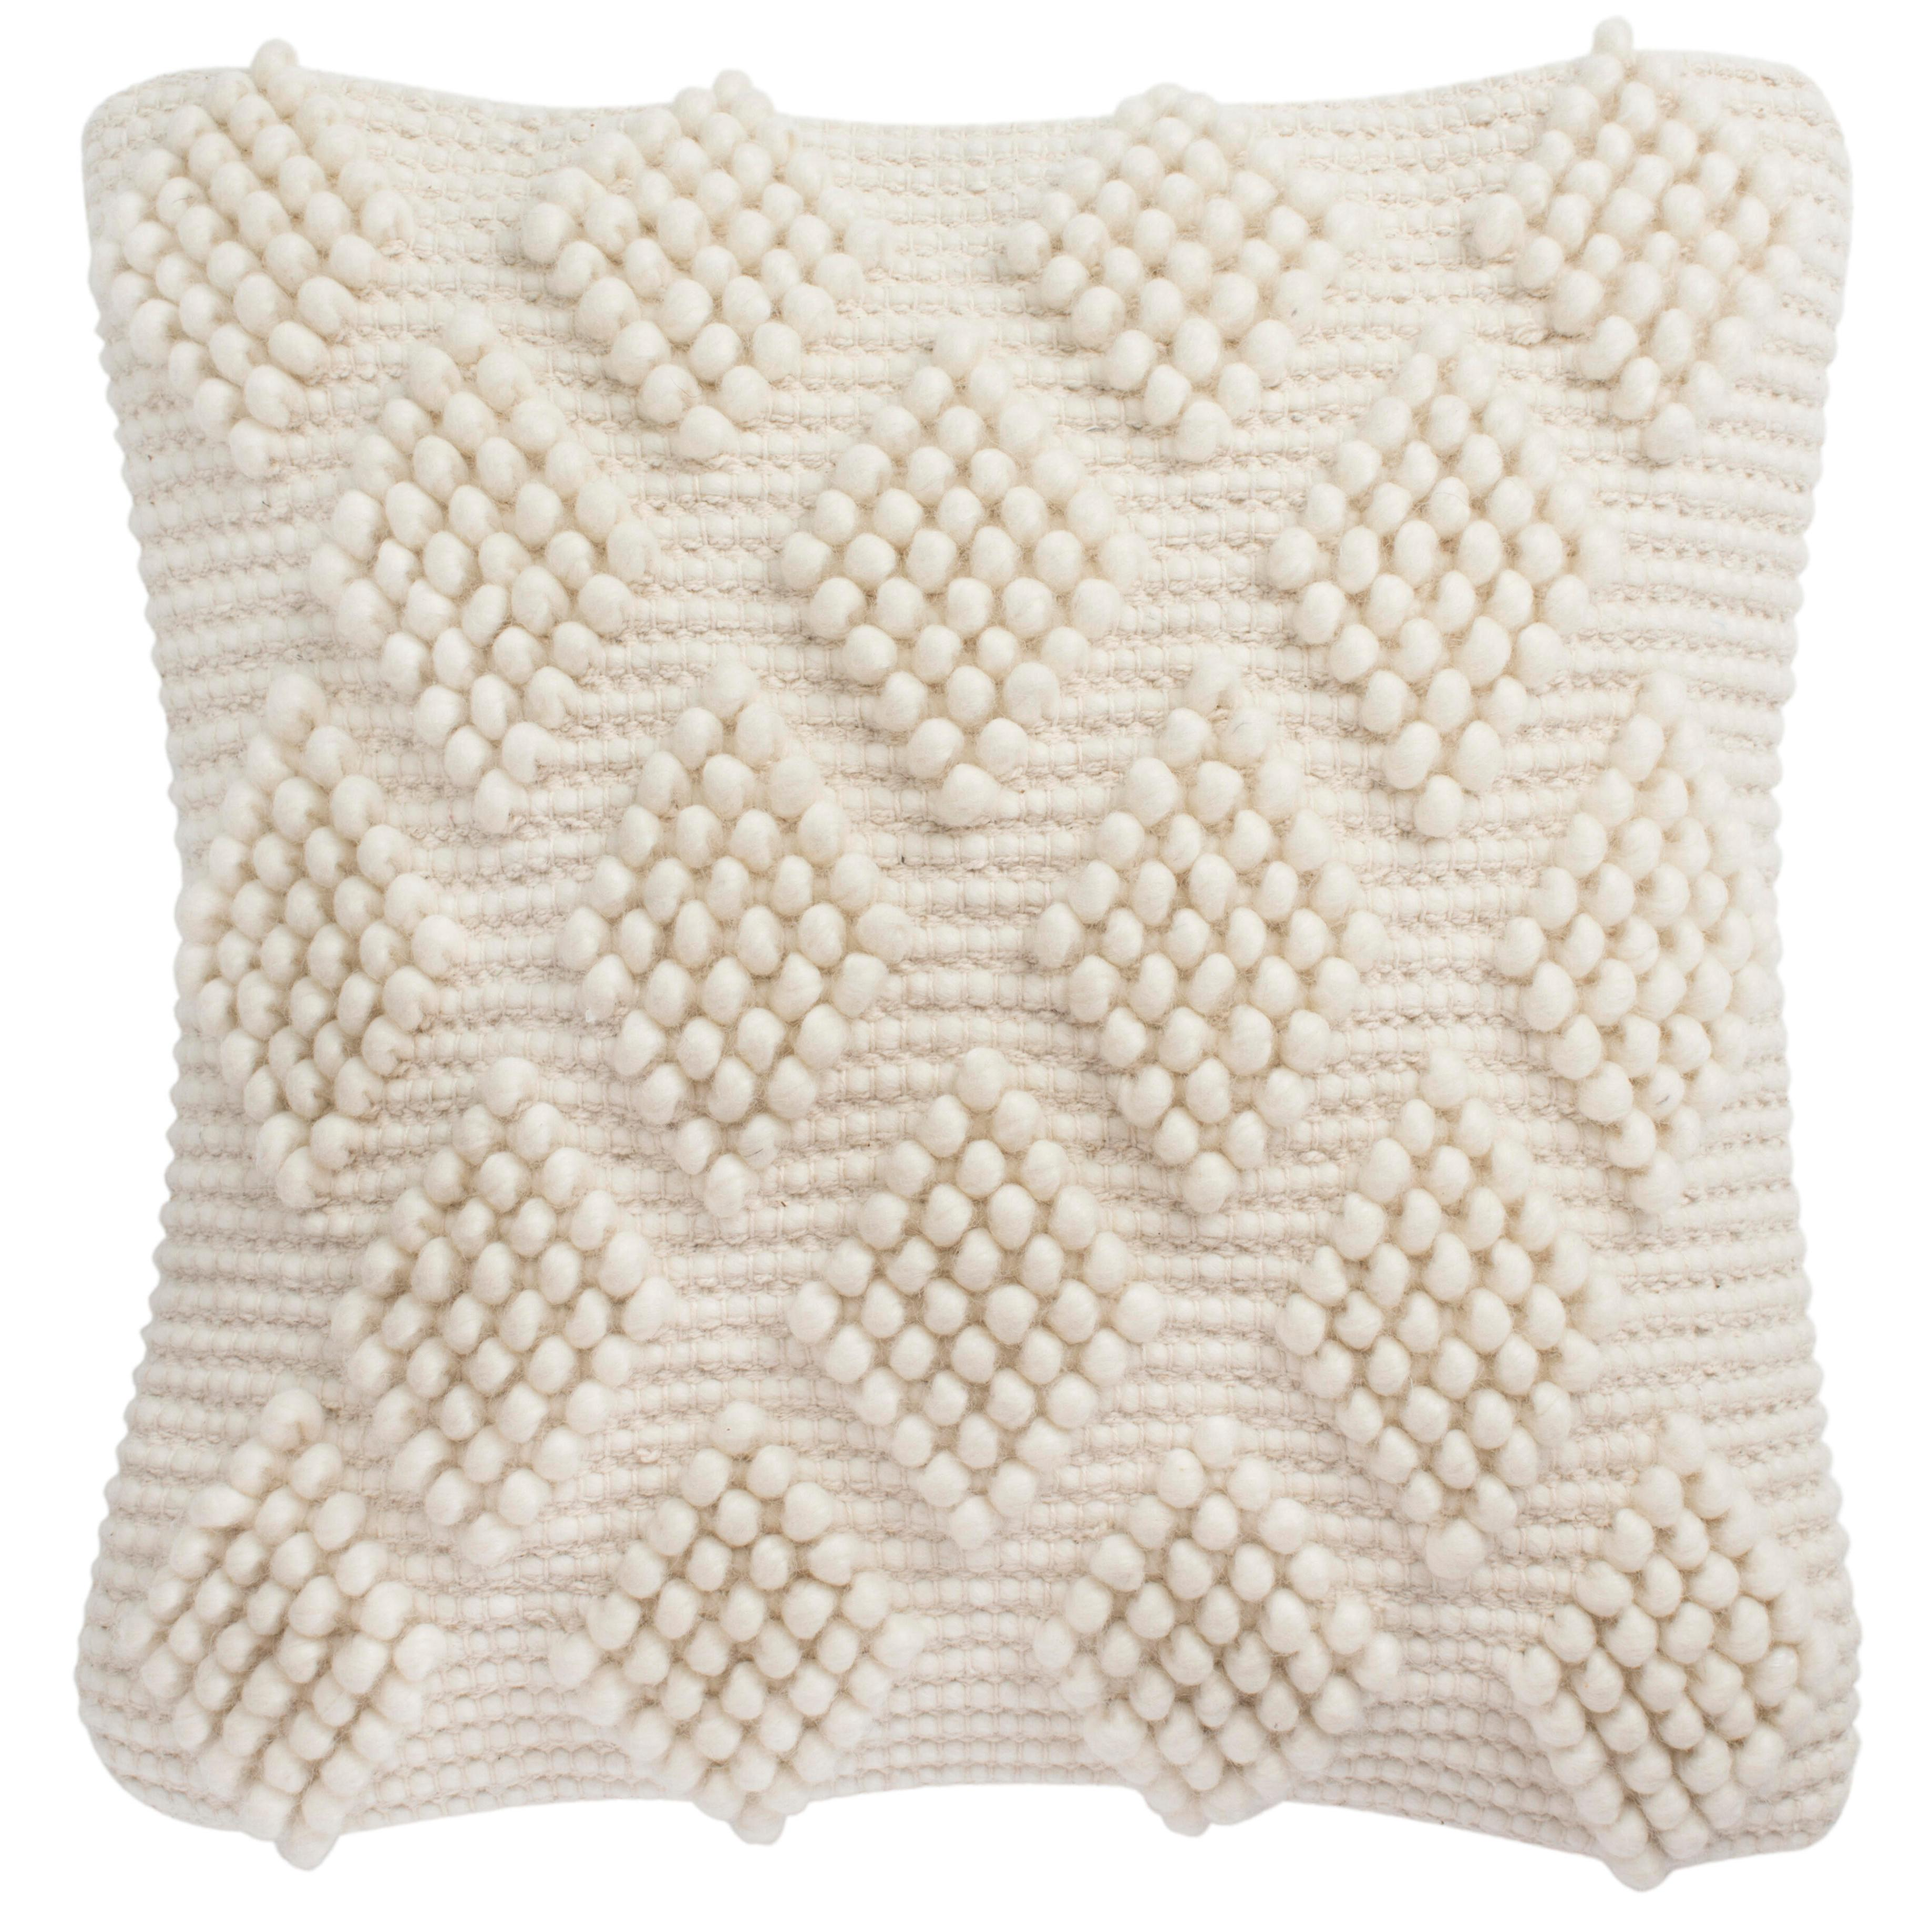 "Spaced Diamond Natural Geometric Throw Pillow/ Down/ 20"" x 20"""